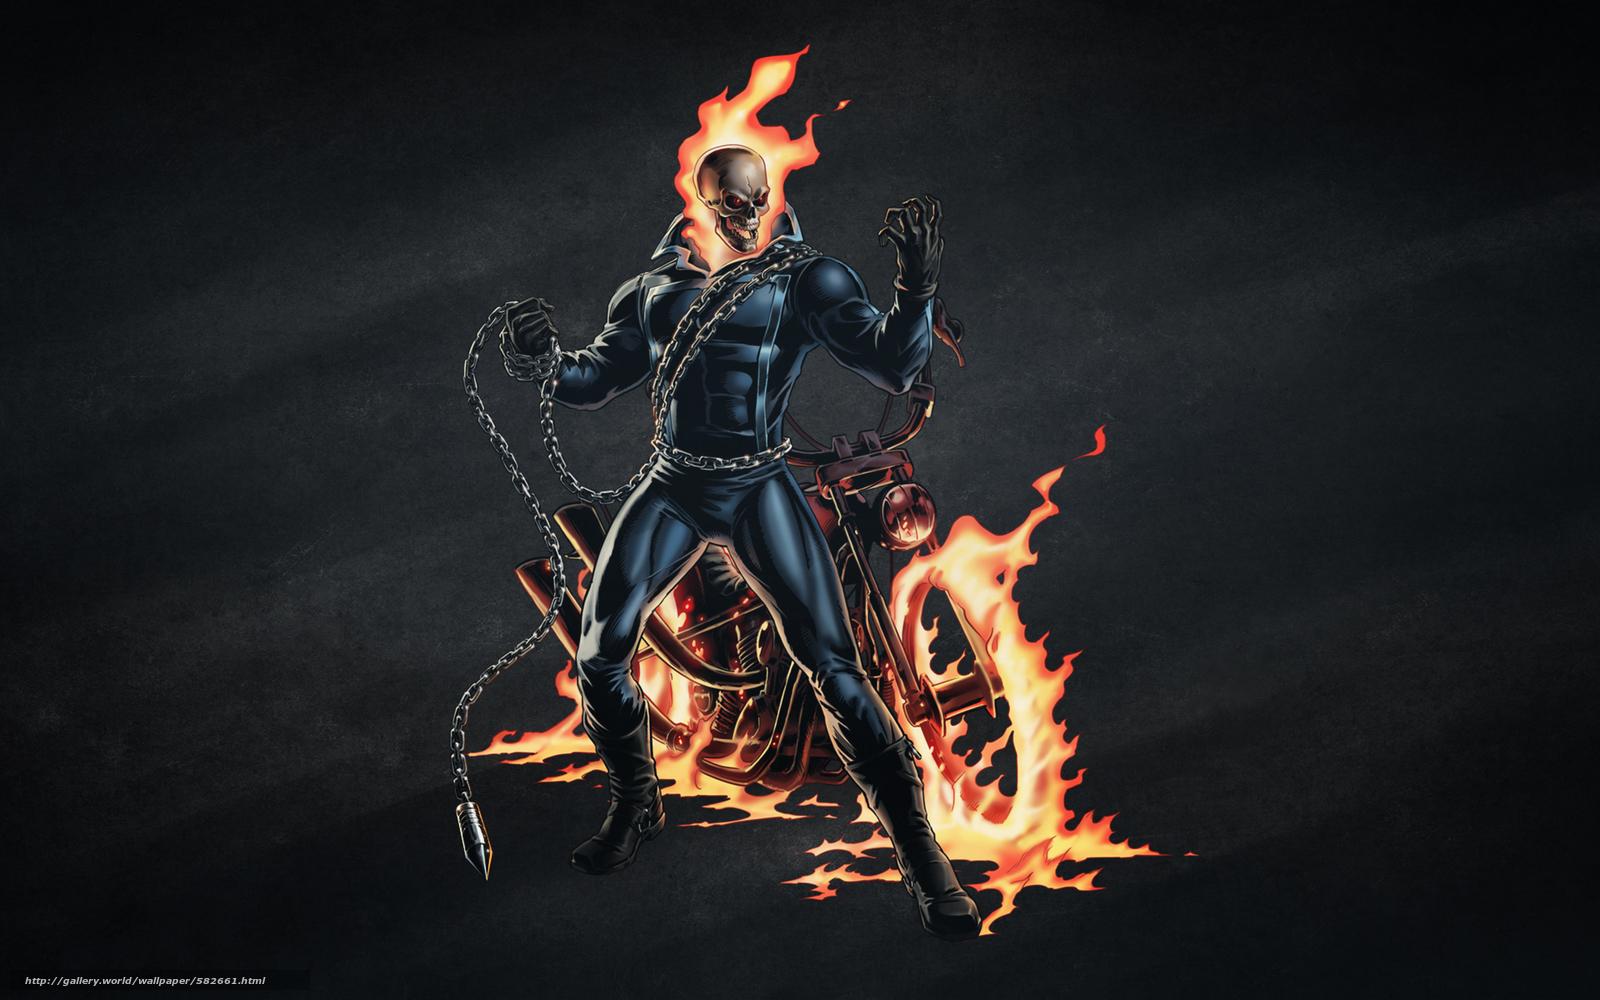 Wallpaper Motorcycle Chain Fire SKELETON Free Desktop